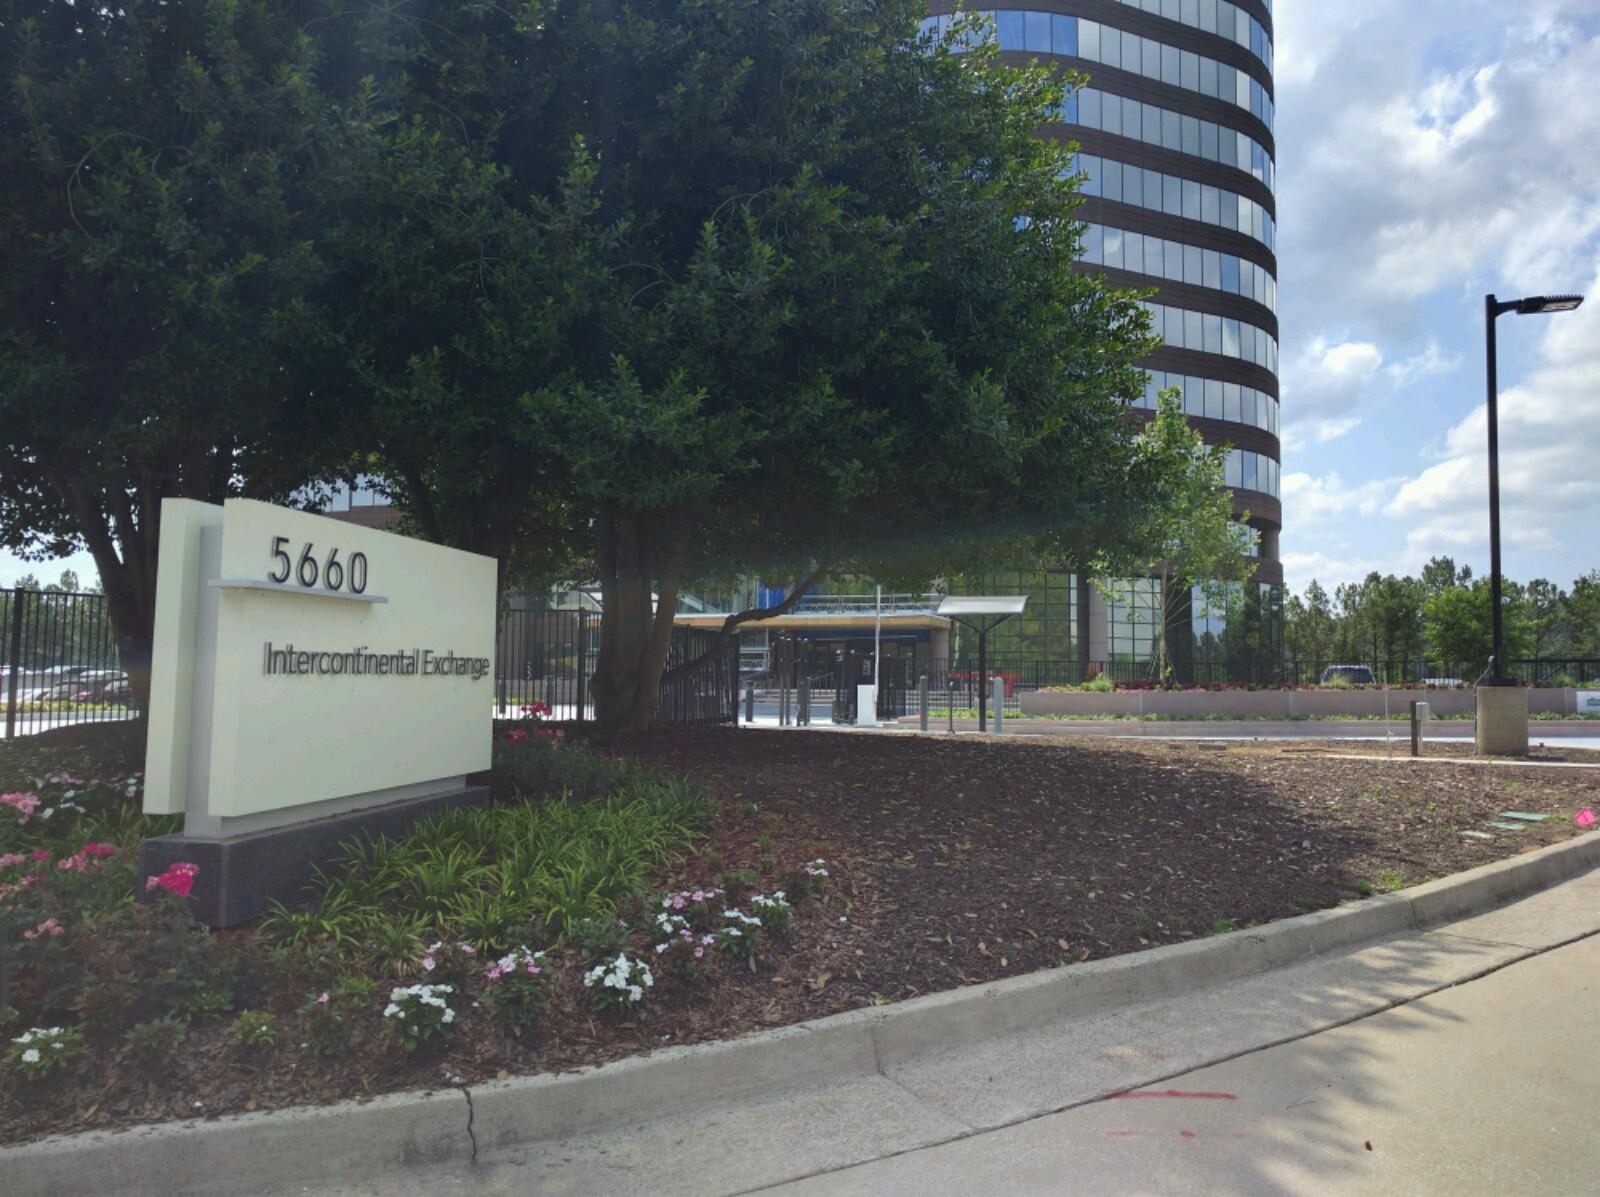 Entrance to Intercontinental Exchange's corporate headquarters in Atlanta, Georgia.